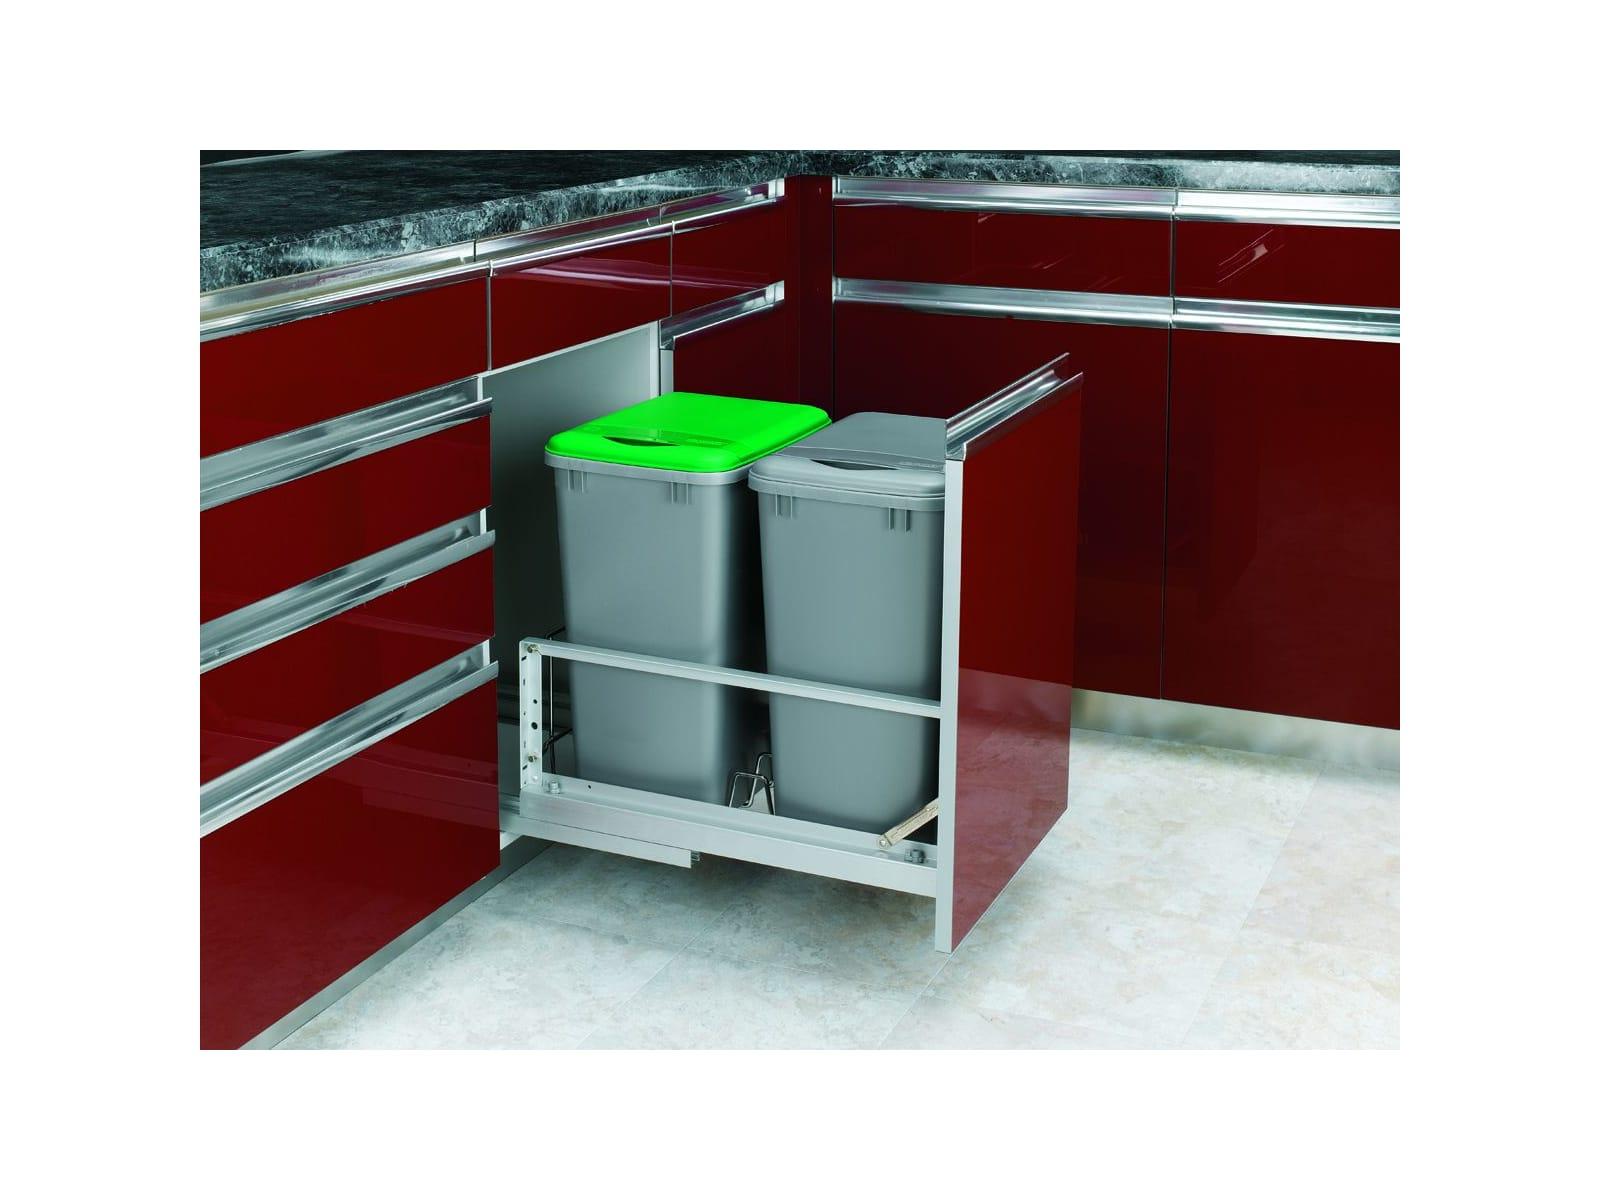 Rev A Shelf 5349 18dm 2 White Series Bottom Mount Double Bin Trash Can With Soft Close Slides 35 Quart Capacity Per Pulirect